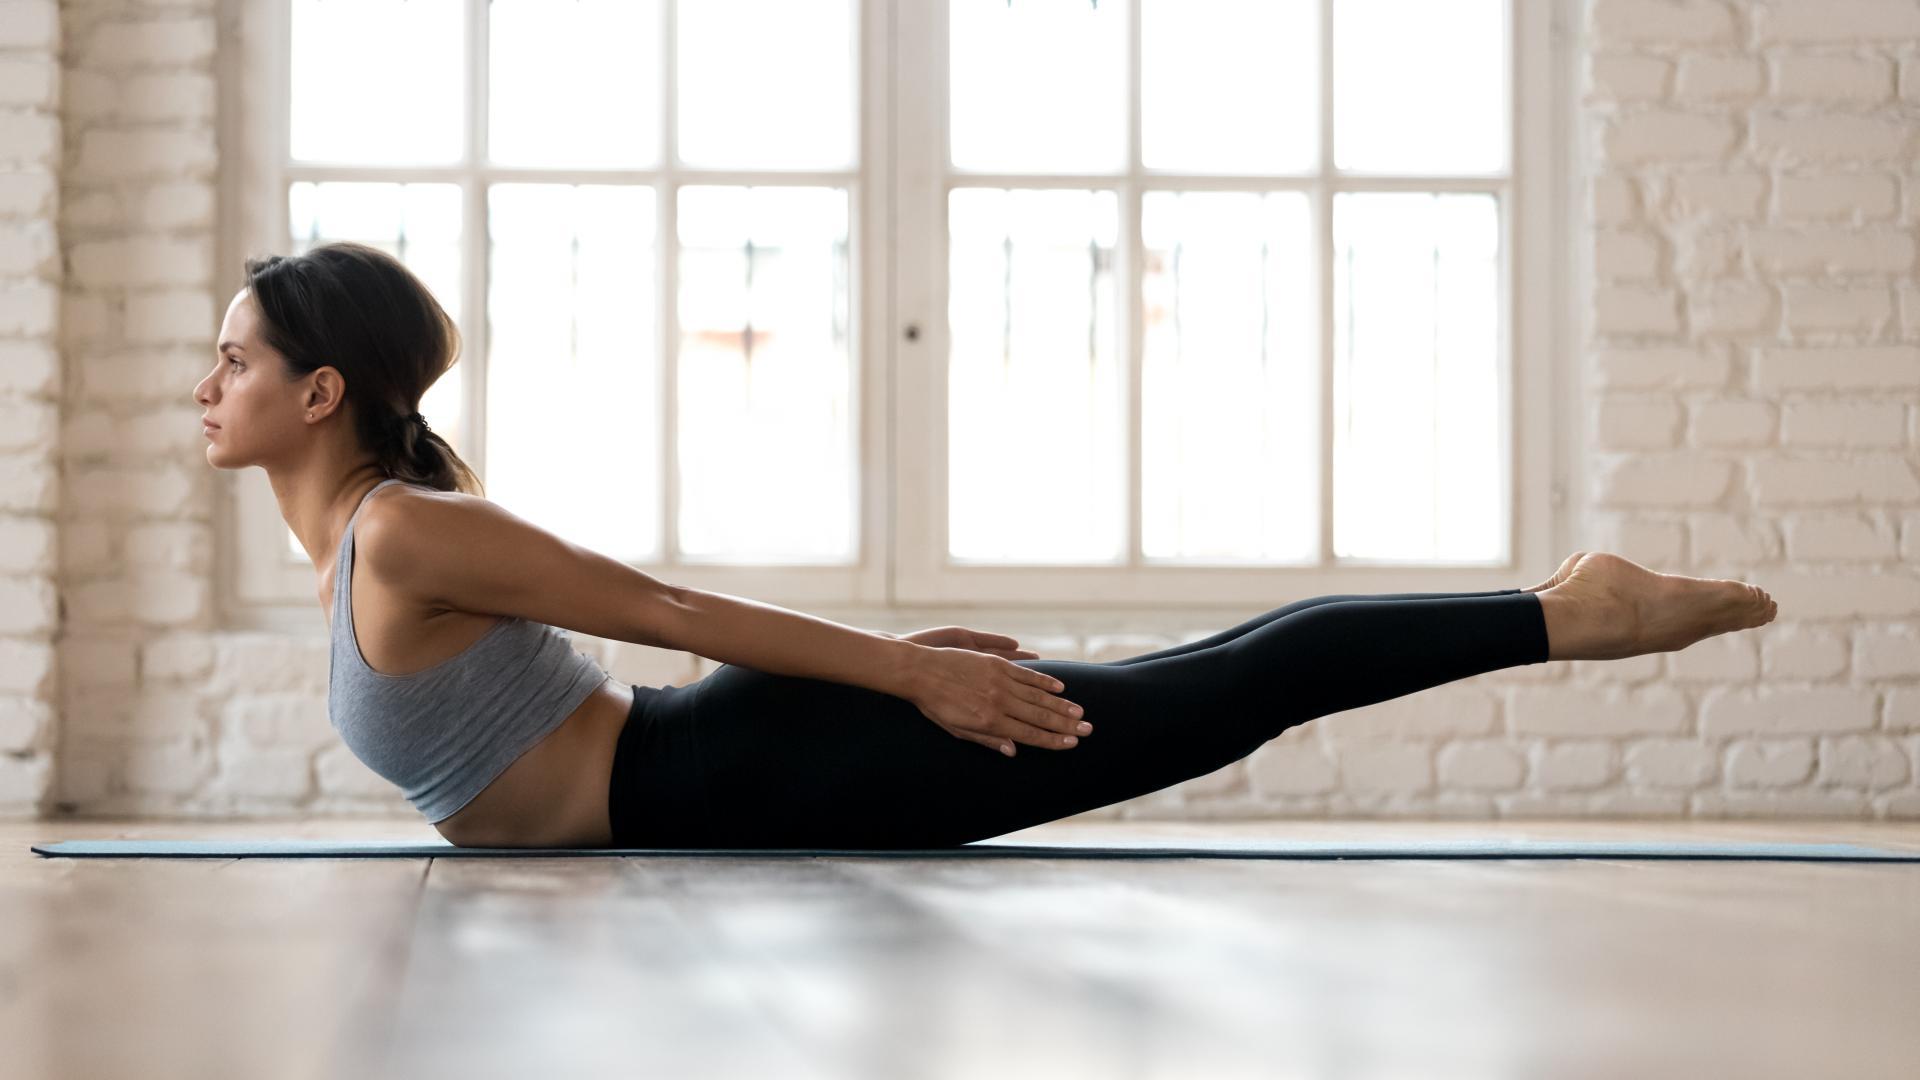 Heuschrecke Yoga